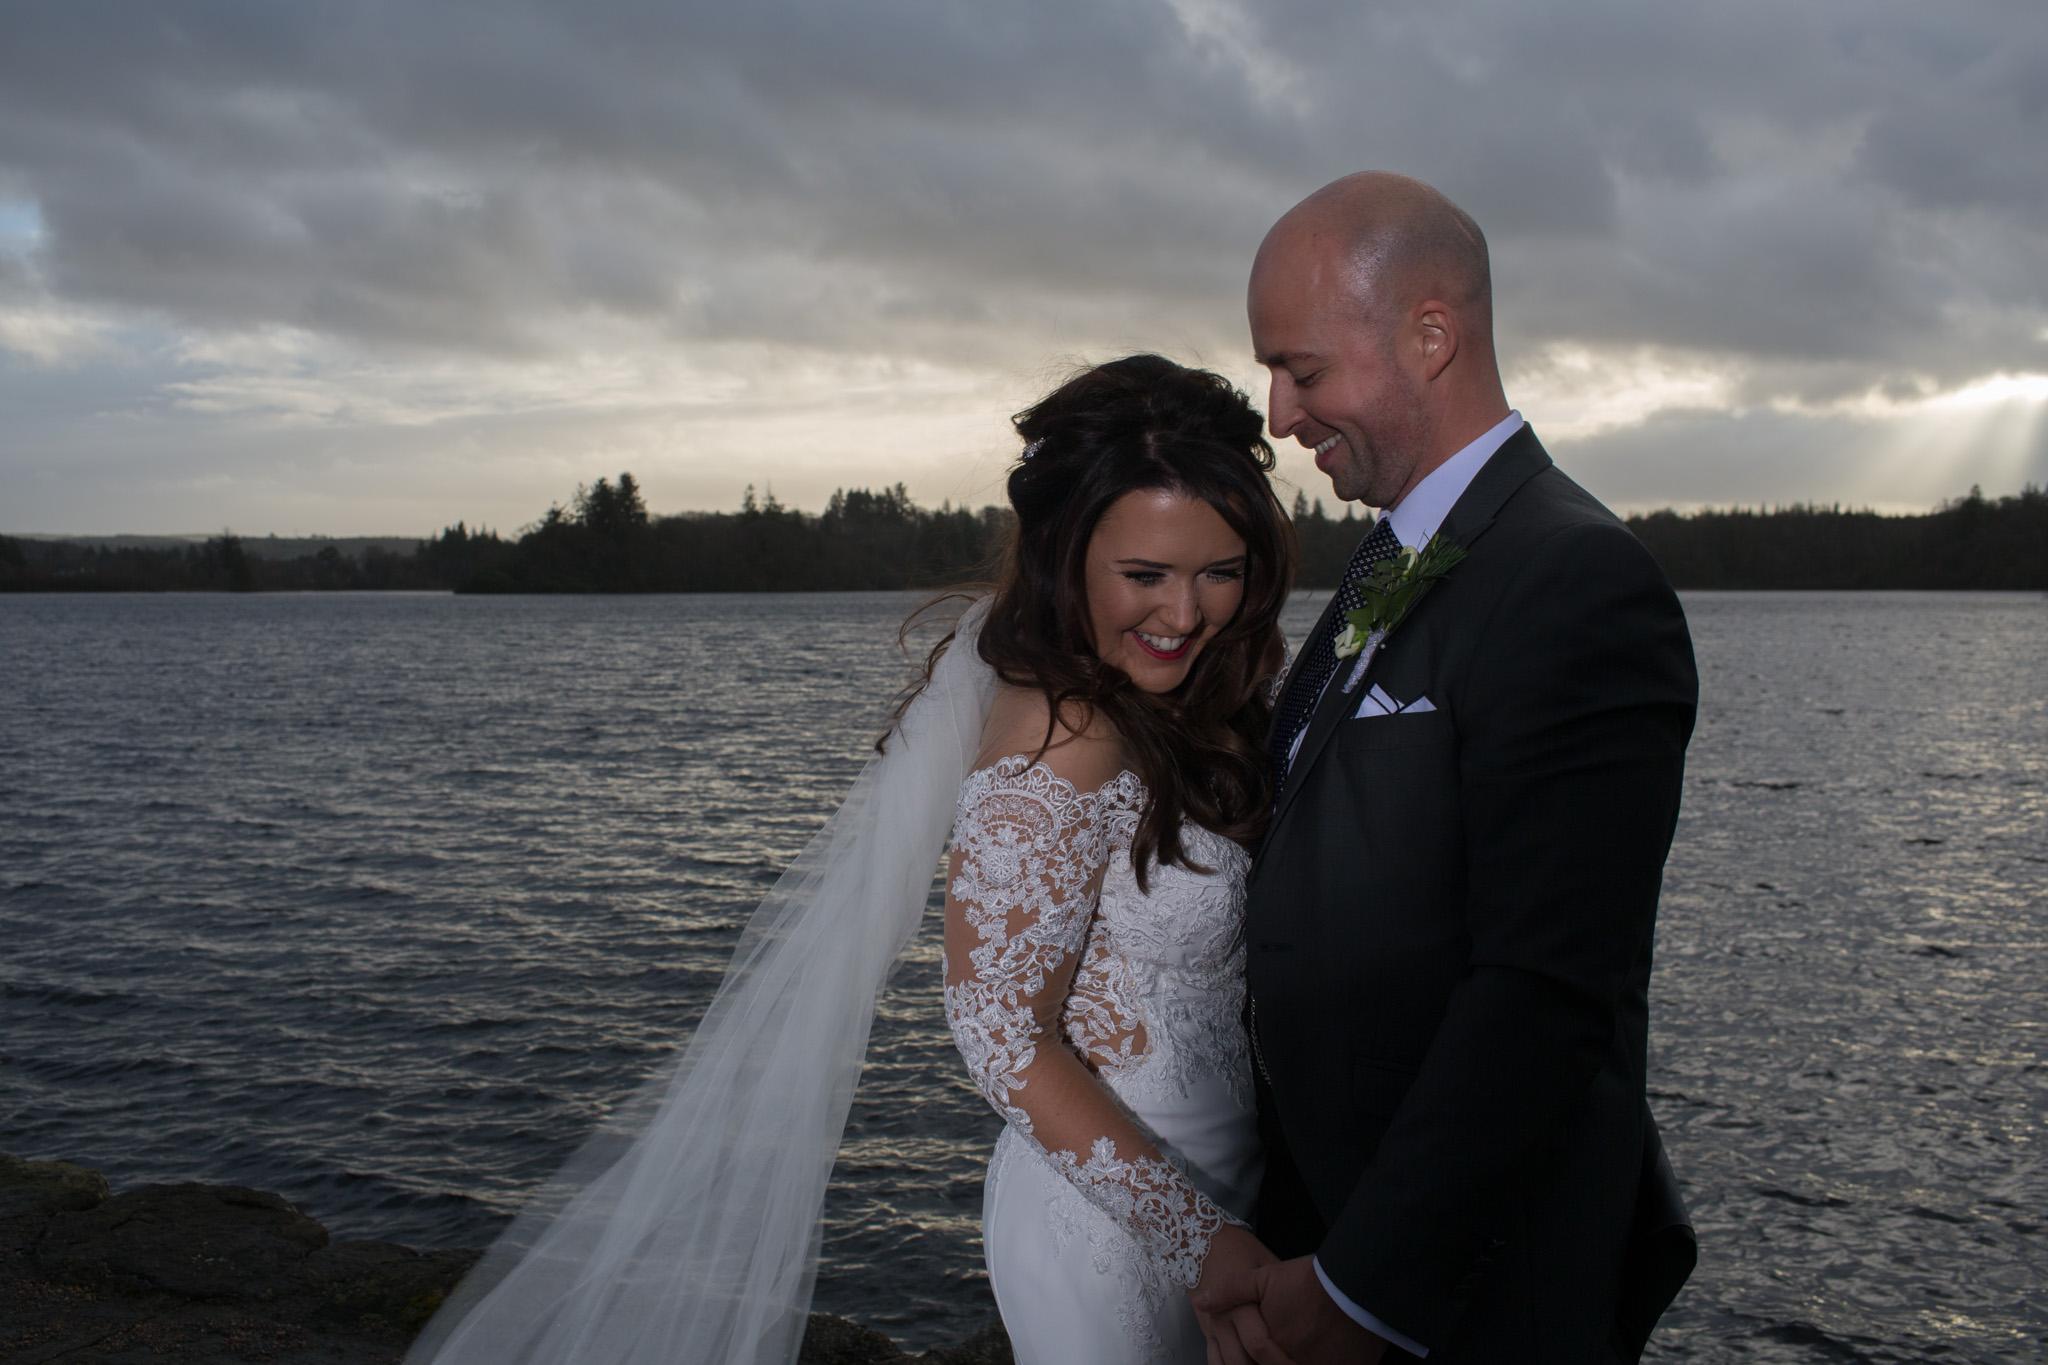 Mark_Barnes_Northern_Ireland_wedding_photographer_Harveys_Point_Donegall_Wedding_photography-Adam&Gemma-38.jpg